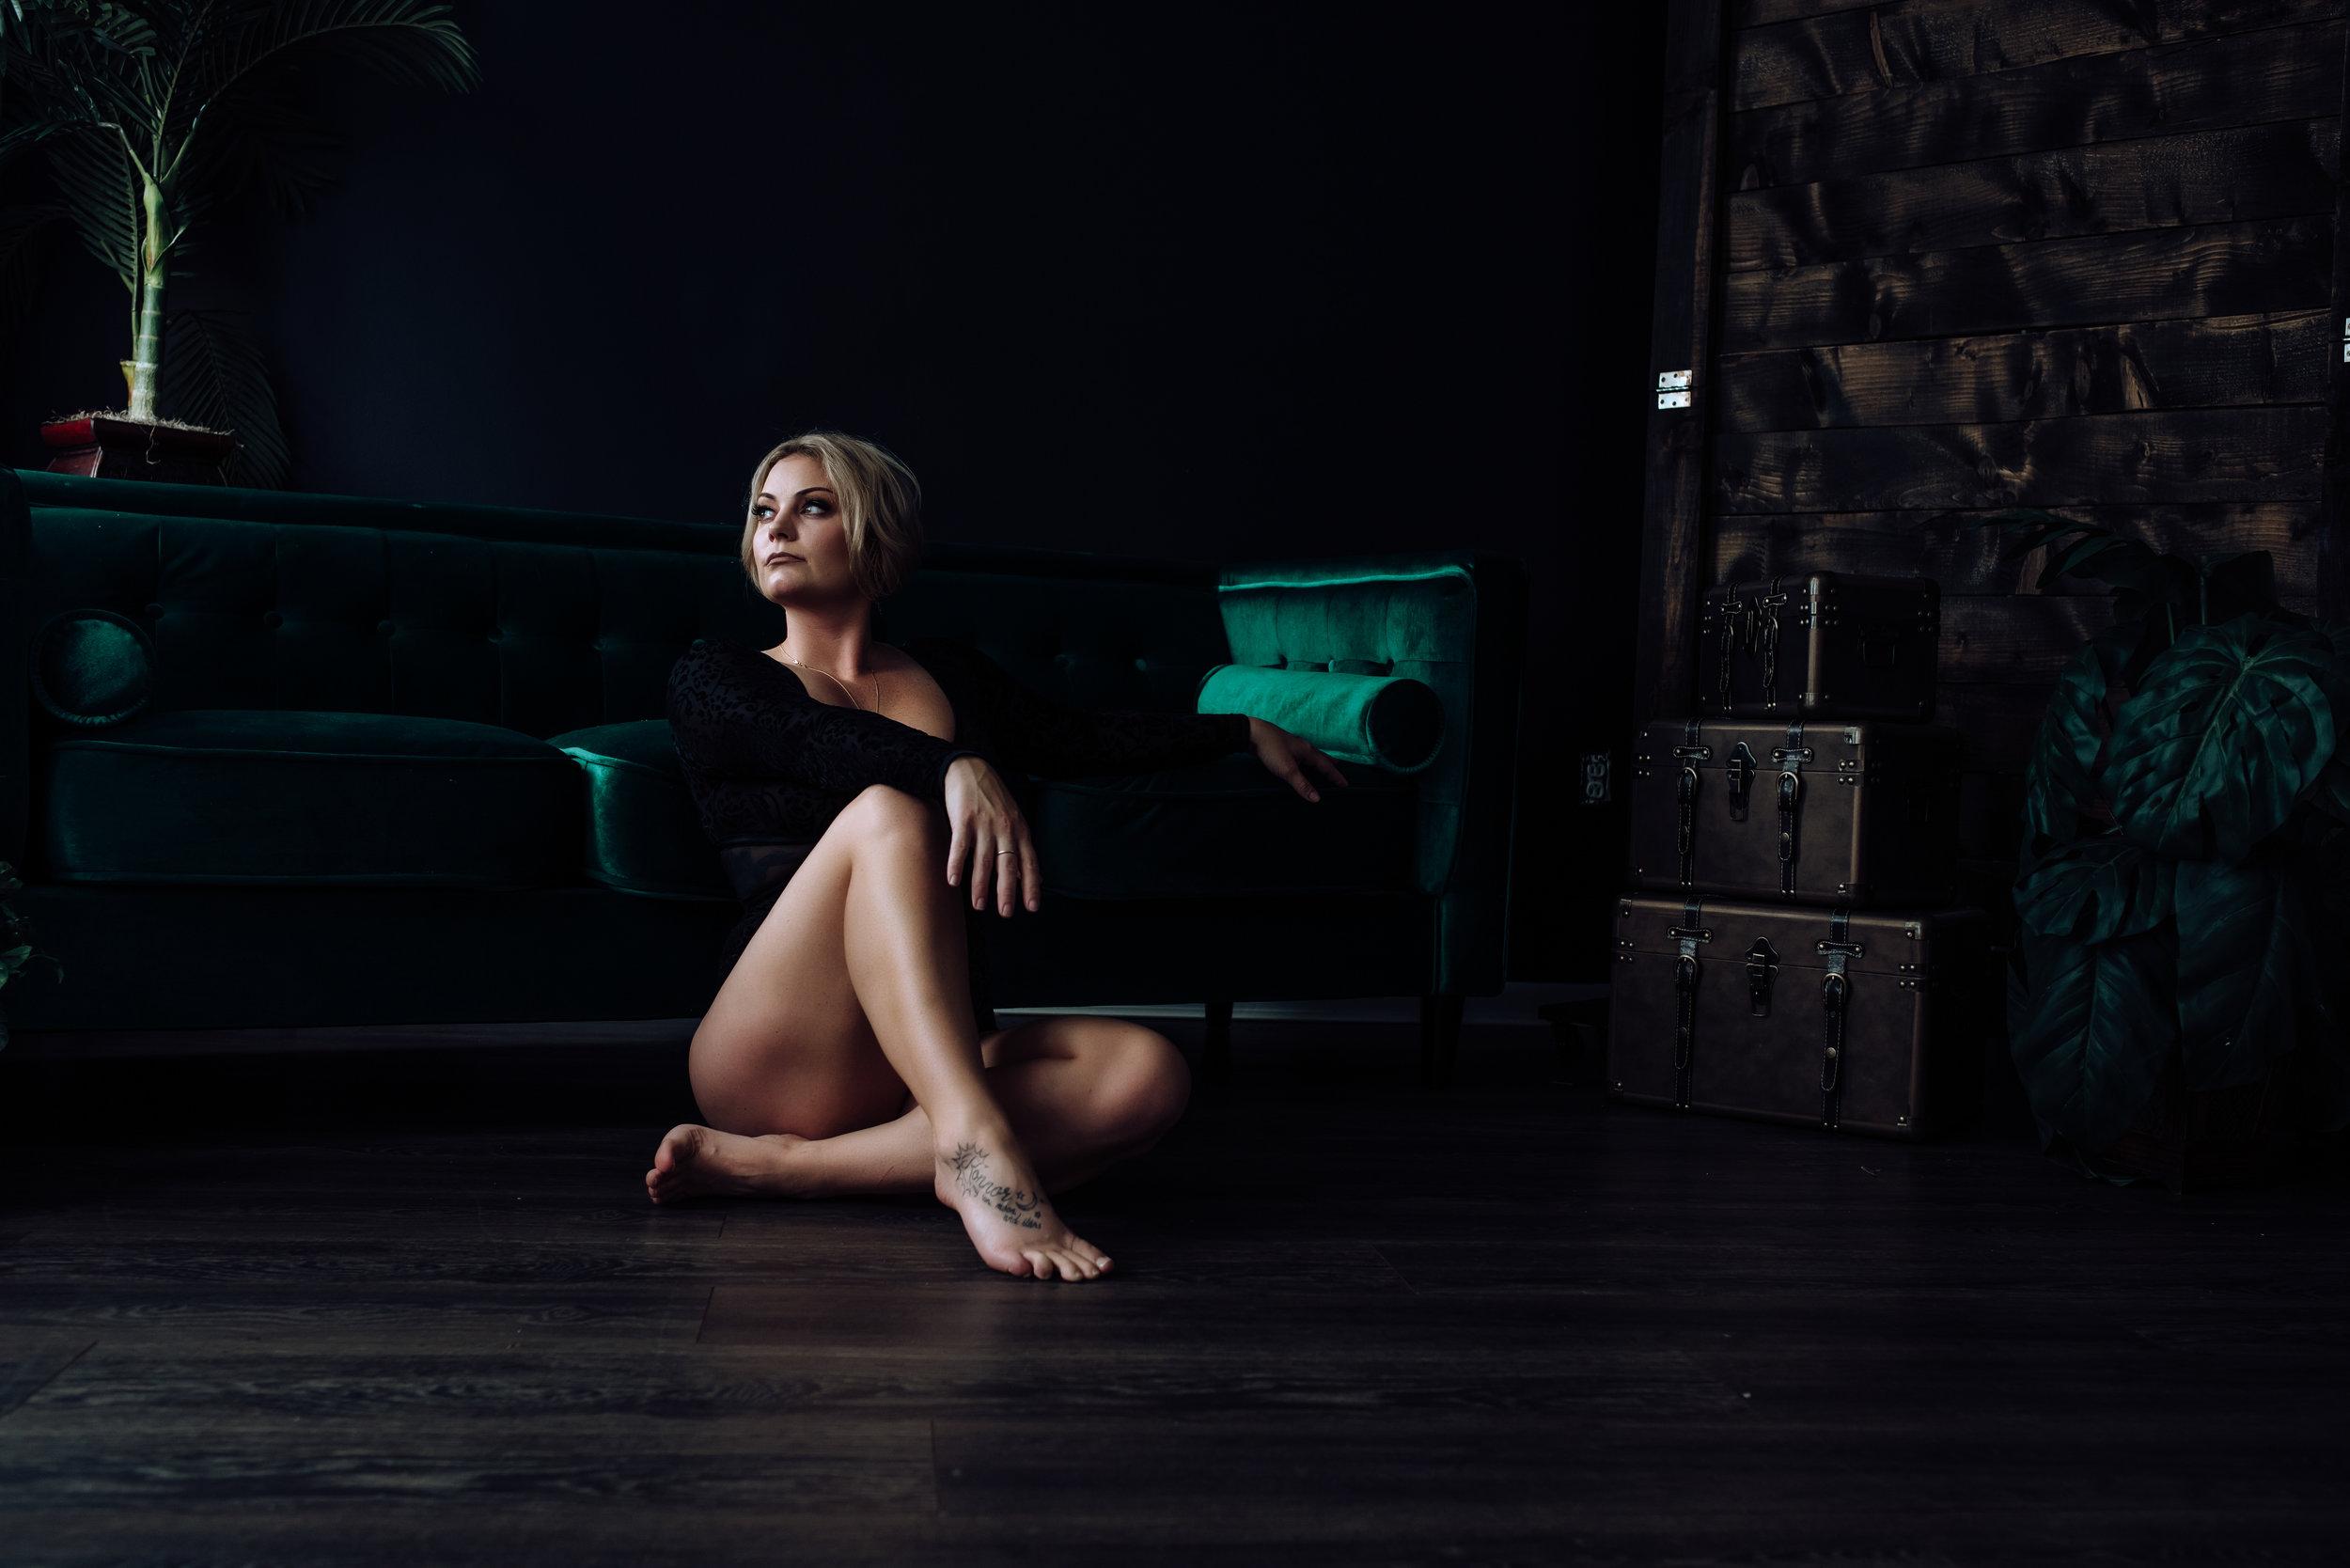 boudoir-photography-best-in-berks-34.jpg